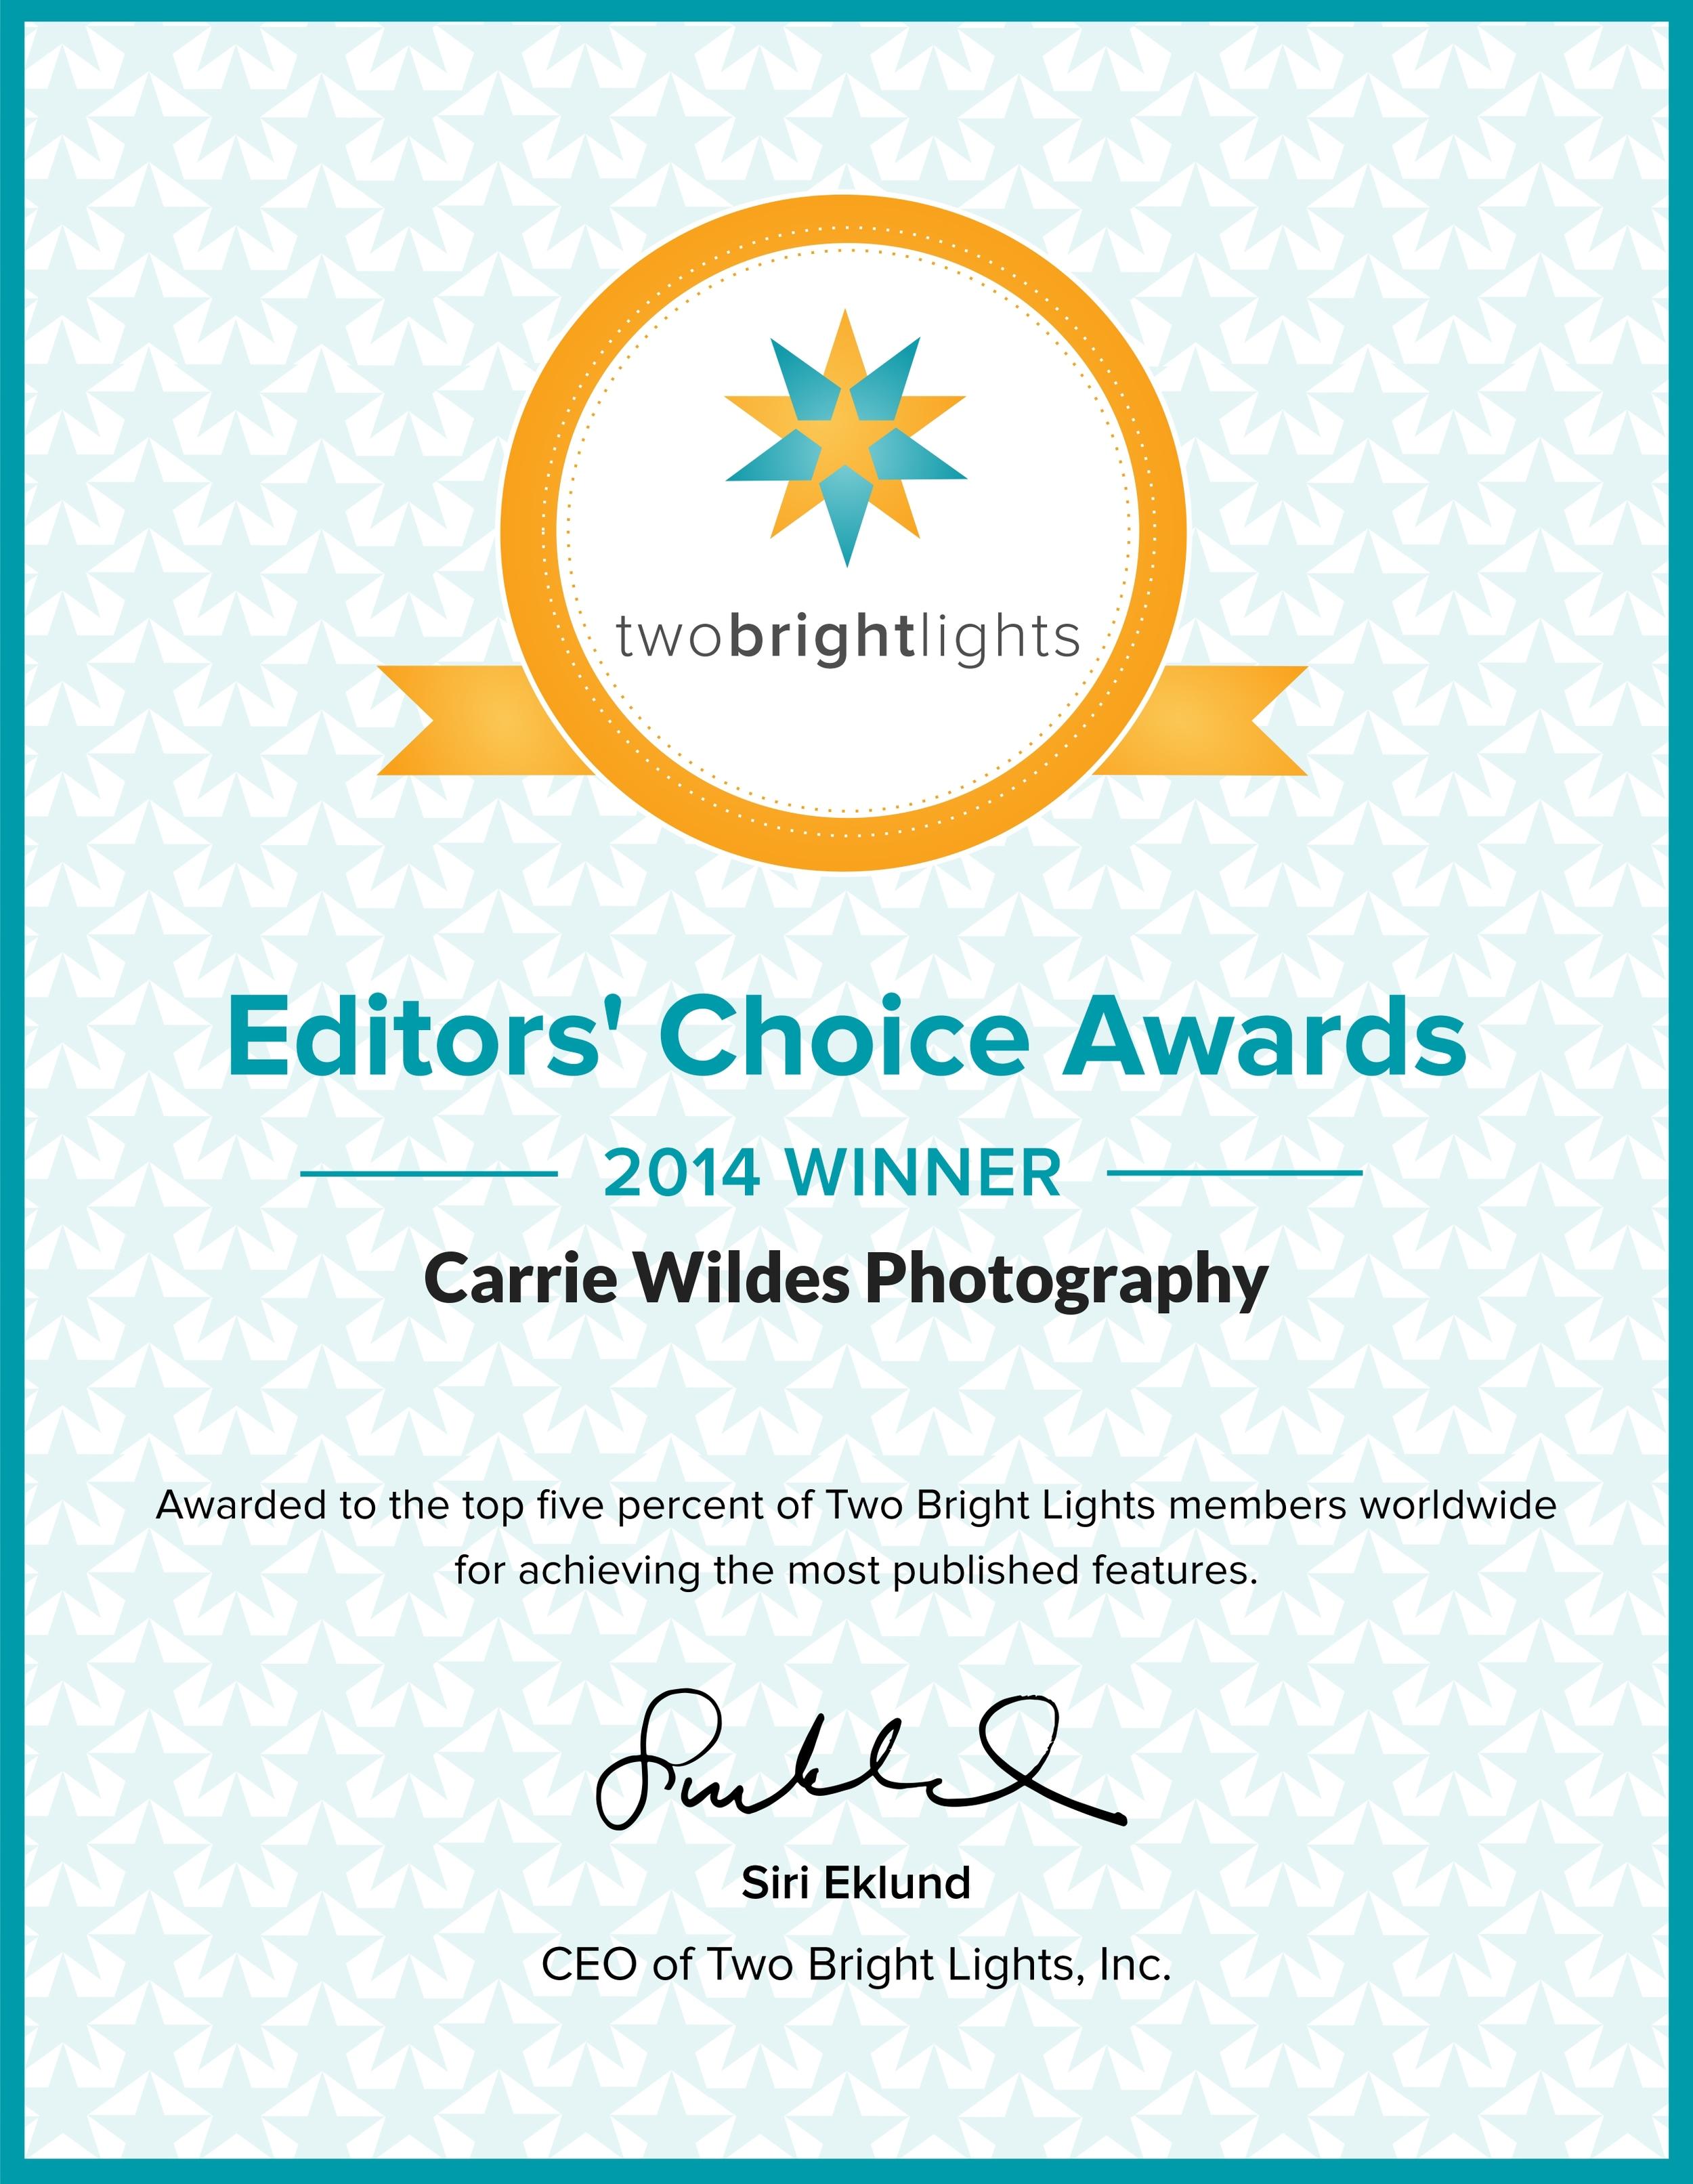 award2014certificate.jpg